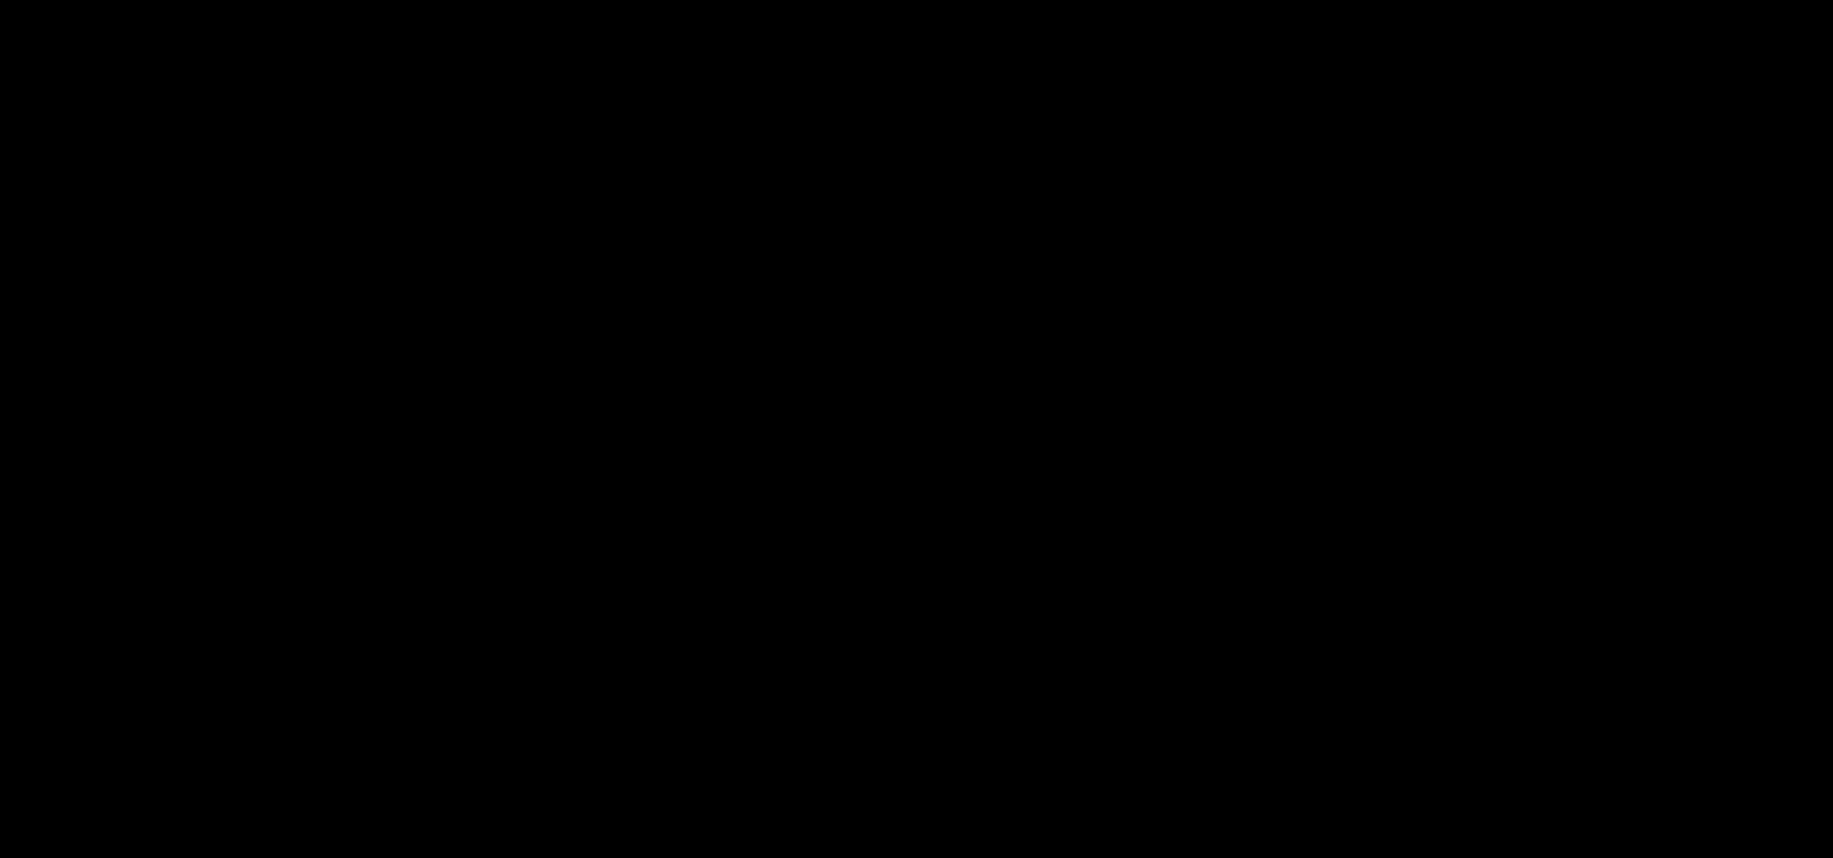 rb-4-30-18